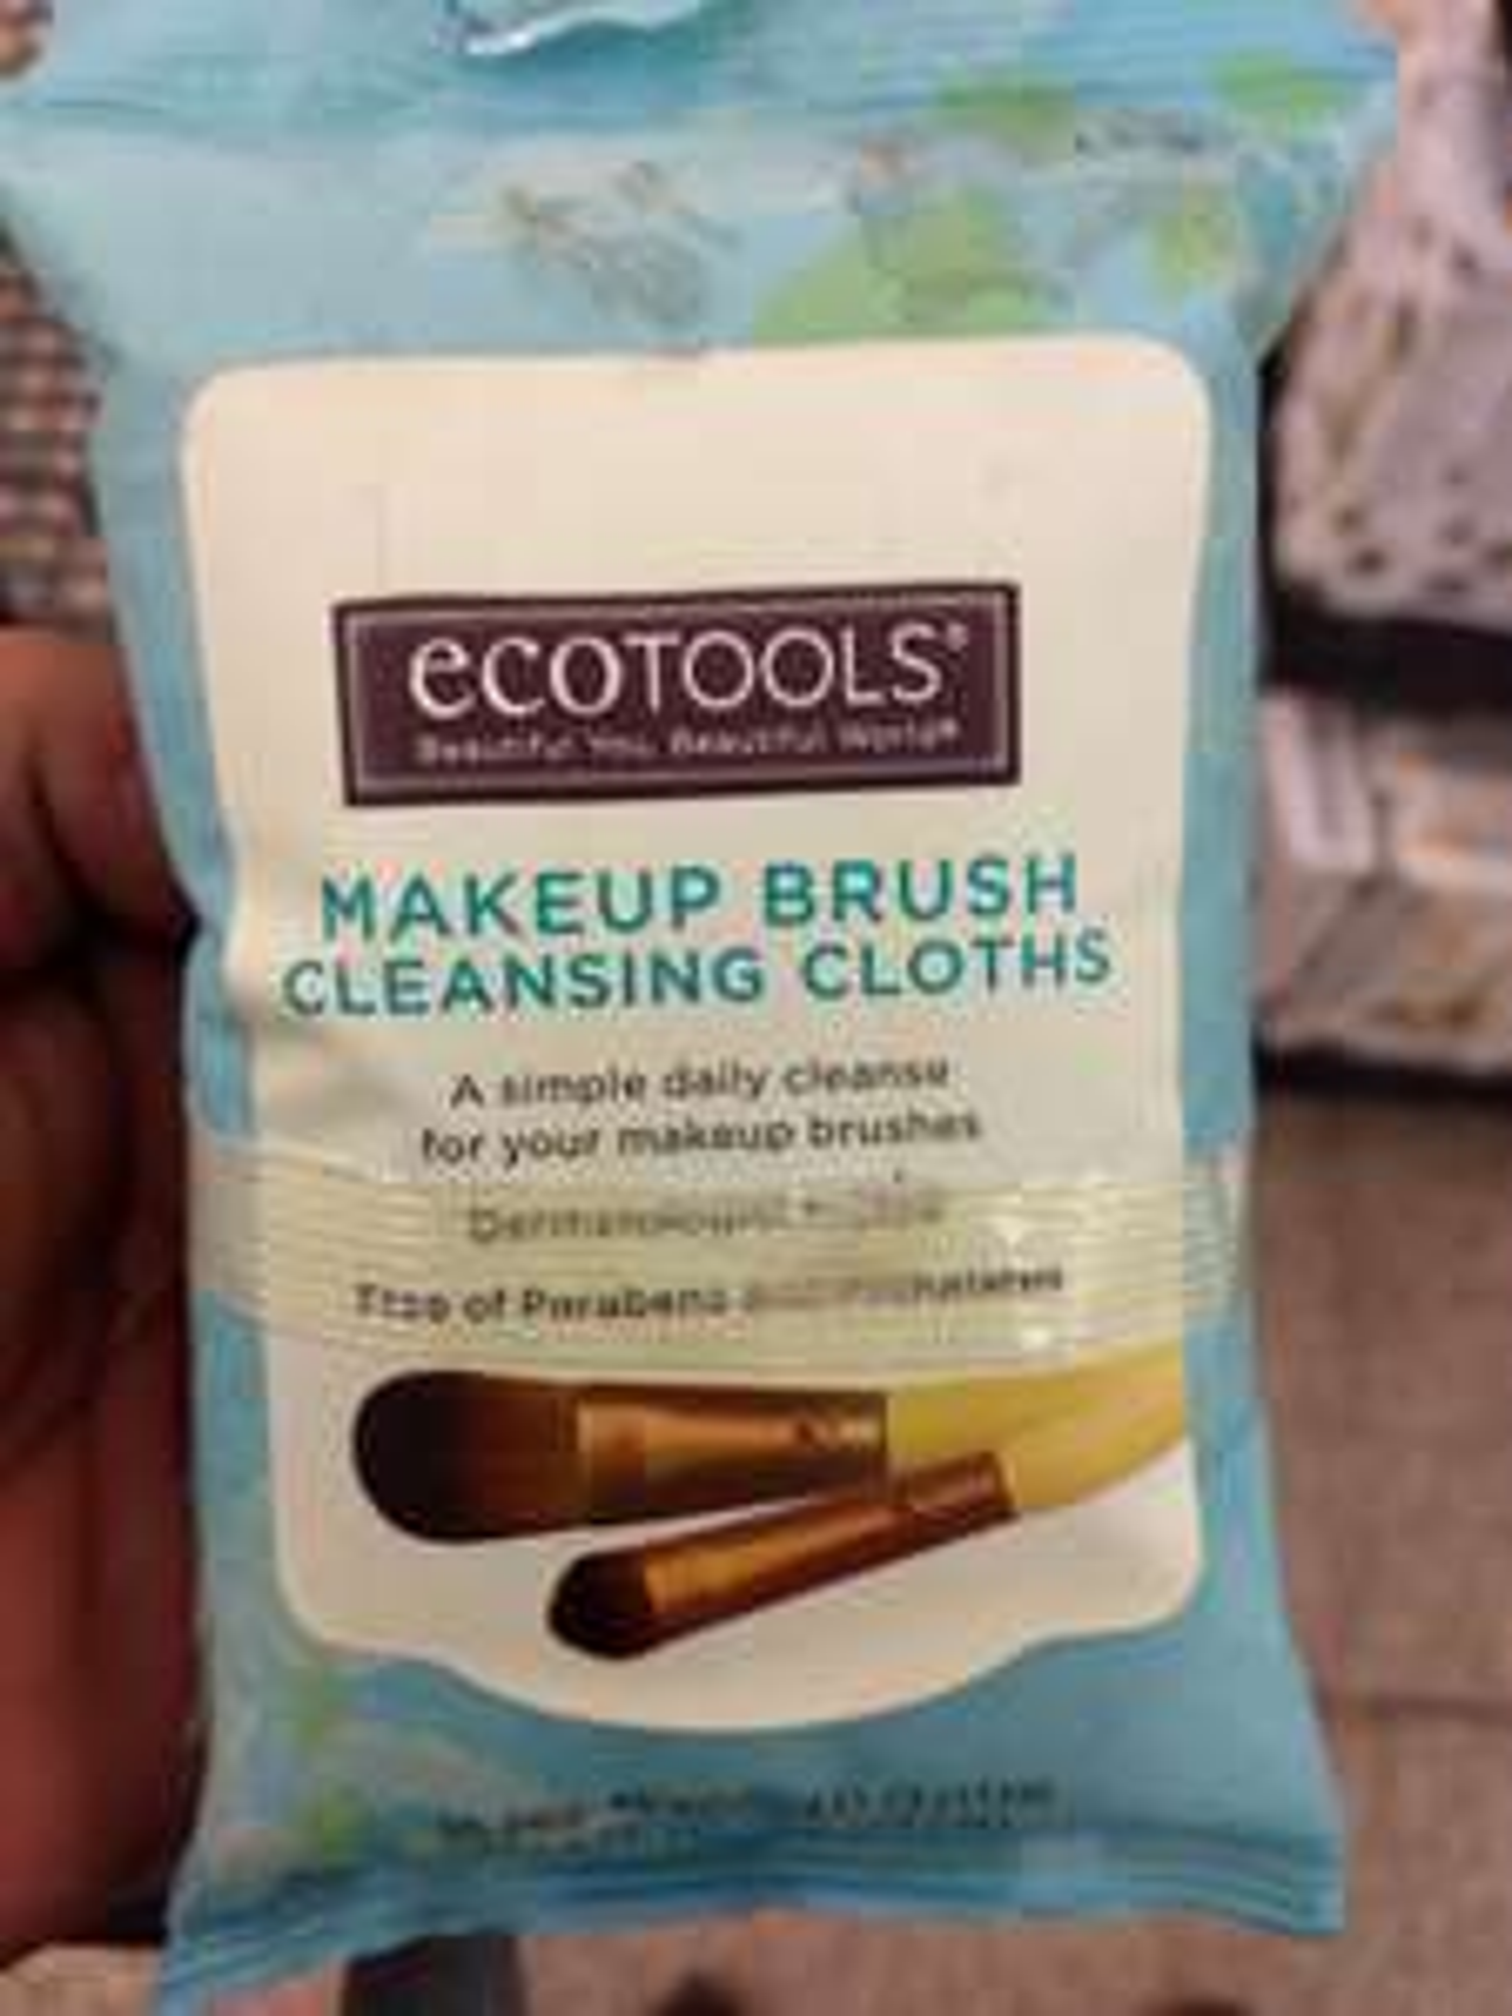 Walmart: Ecotools MakeUp Brush Cleansing Cloths